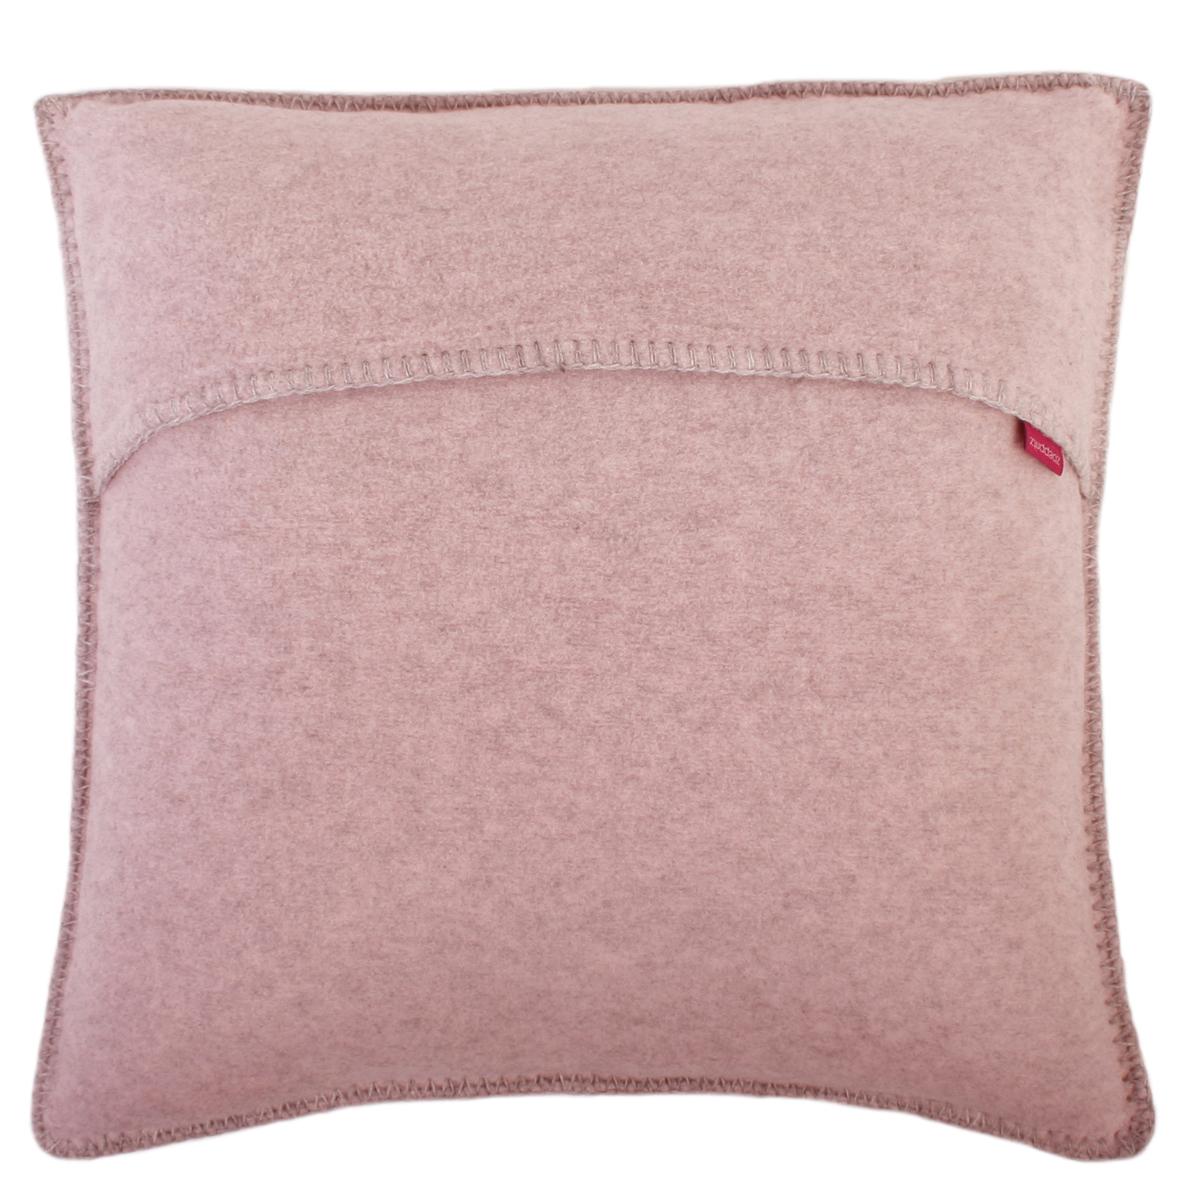 soft wool zoeppritz since 1828. Black Bedroom Furniture Sets. Home Design Ideas